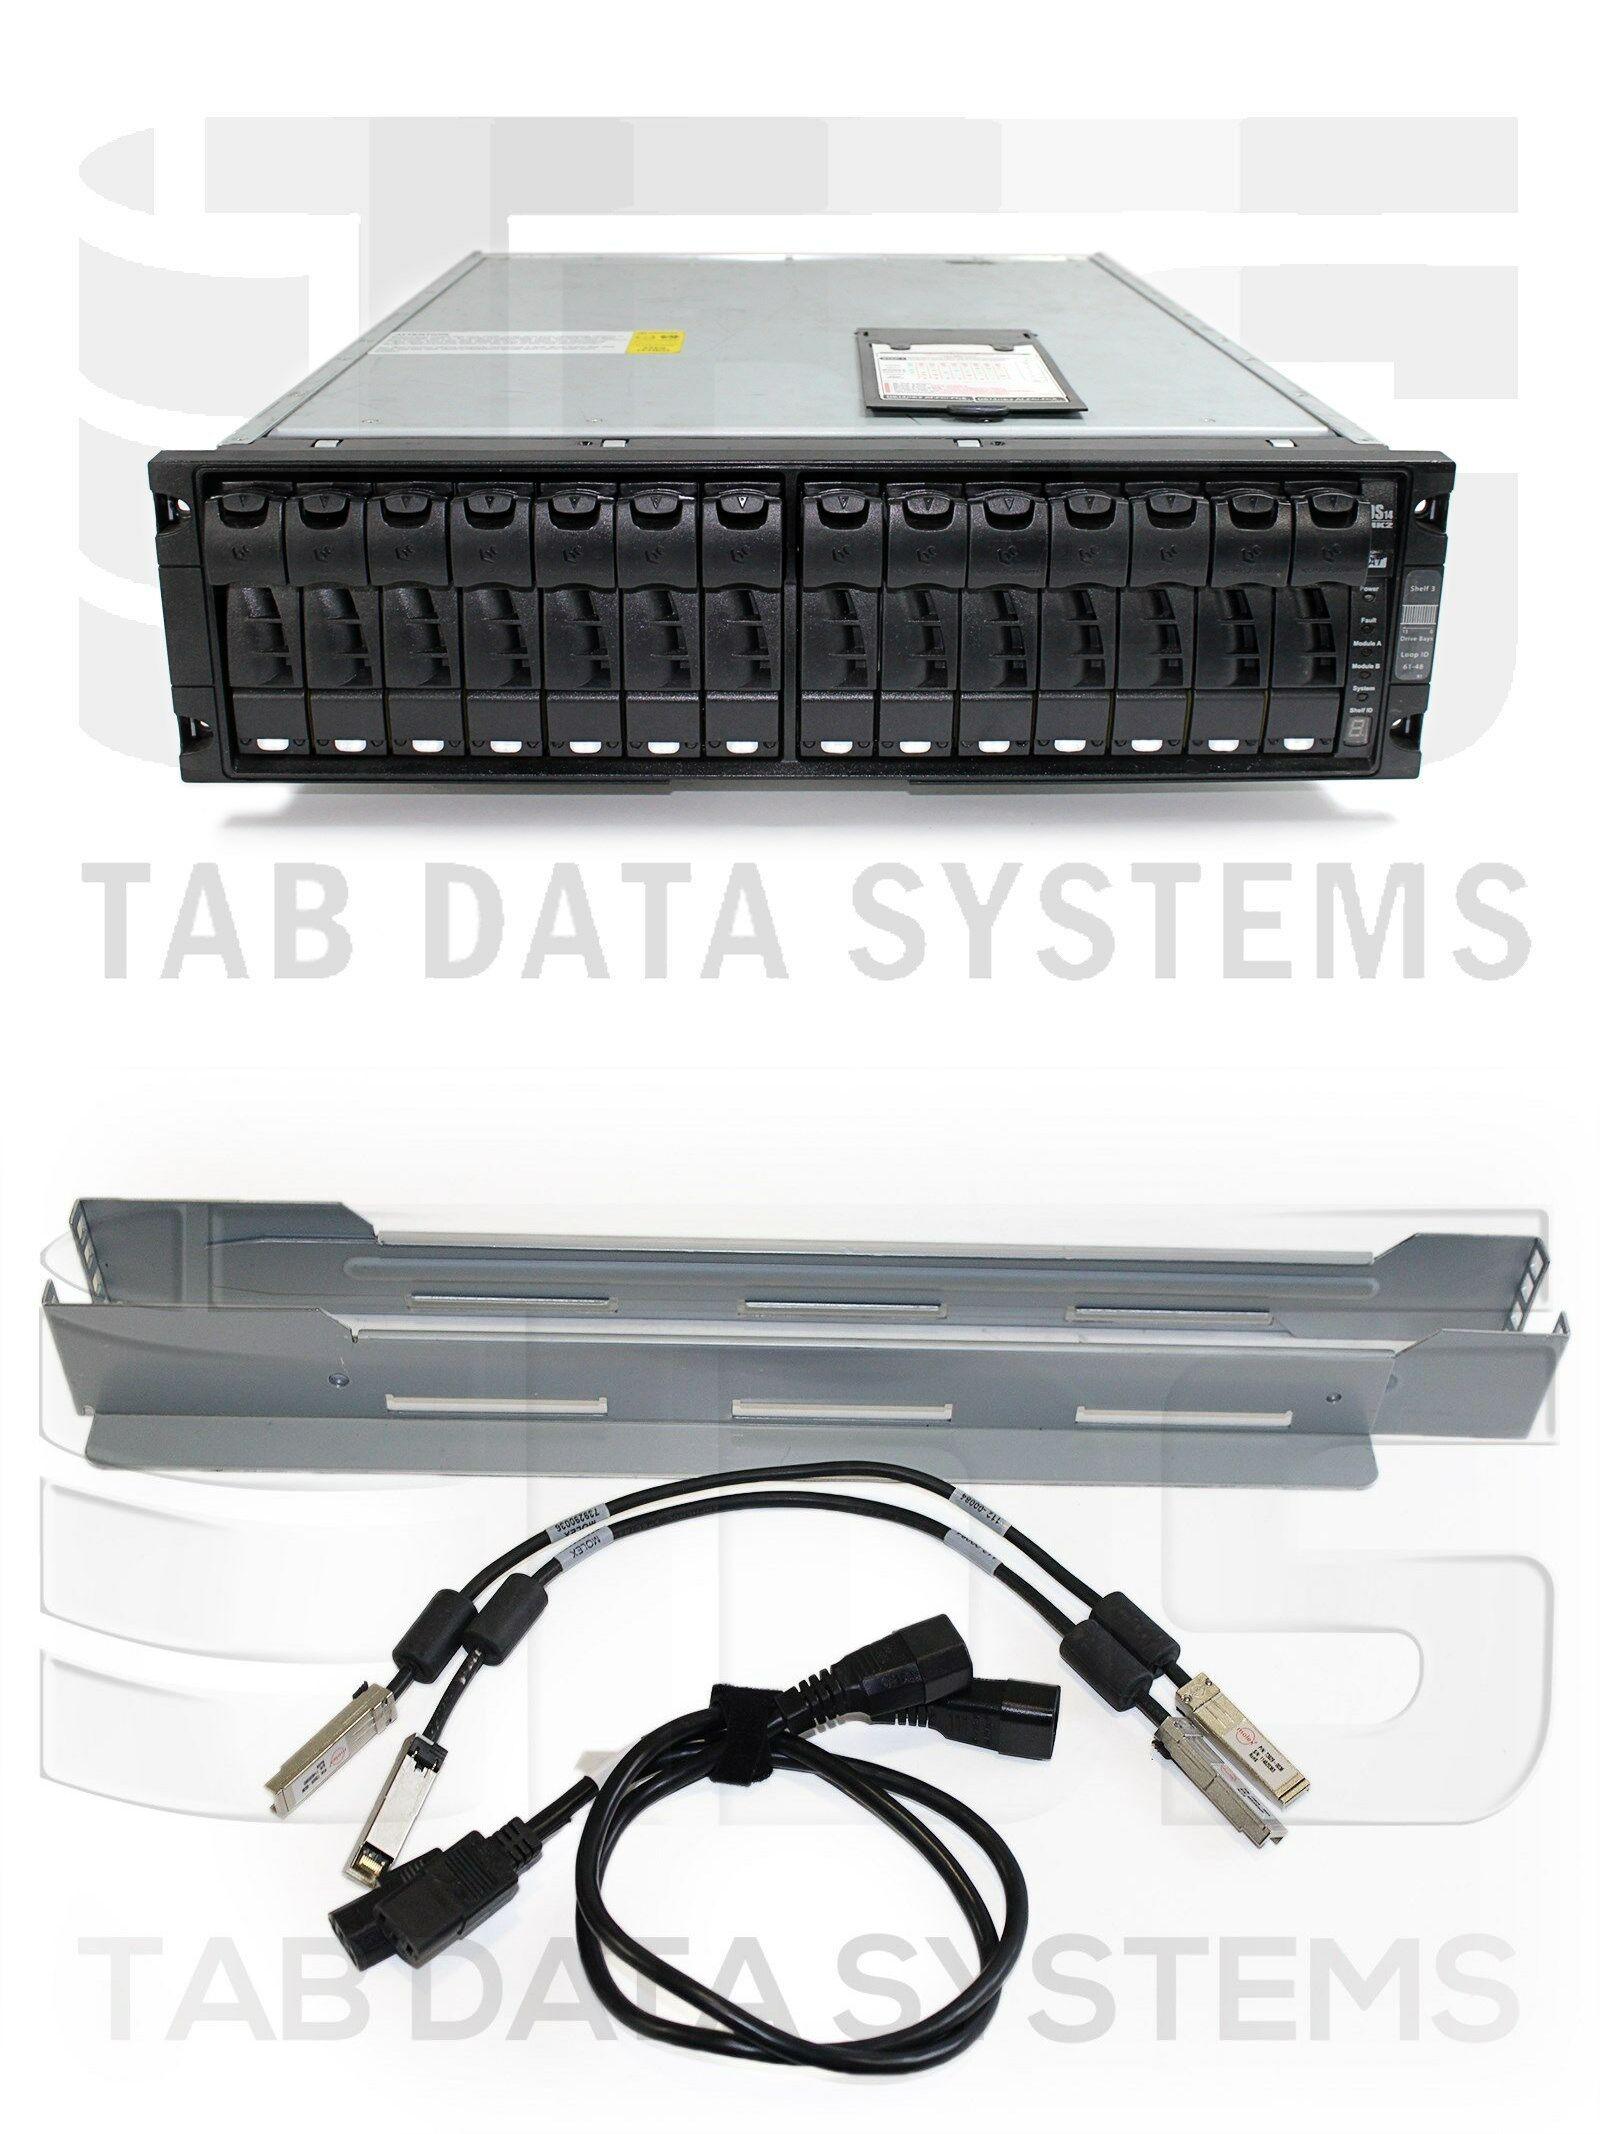 San Disk Arrays 58317 Netapp Ds14mk2 At W 14x New X294a R5 2tb 7 2k 3gbps 3 5 Sata Hdd Buy It Now Only 1595 On Ebay Arrays Ebay Mac Mini Data Storage